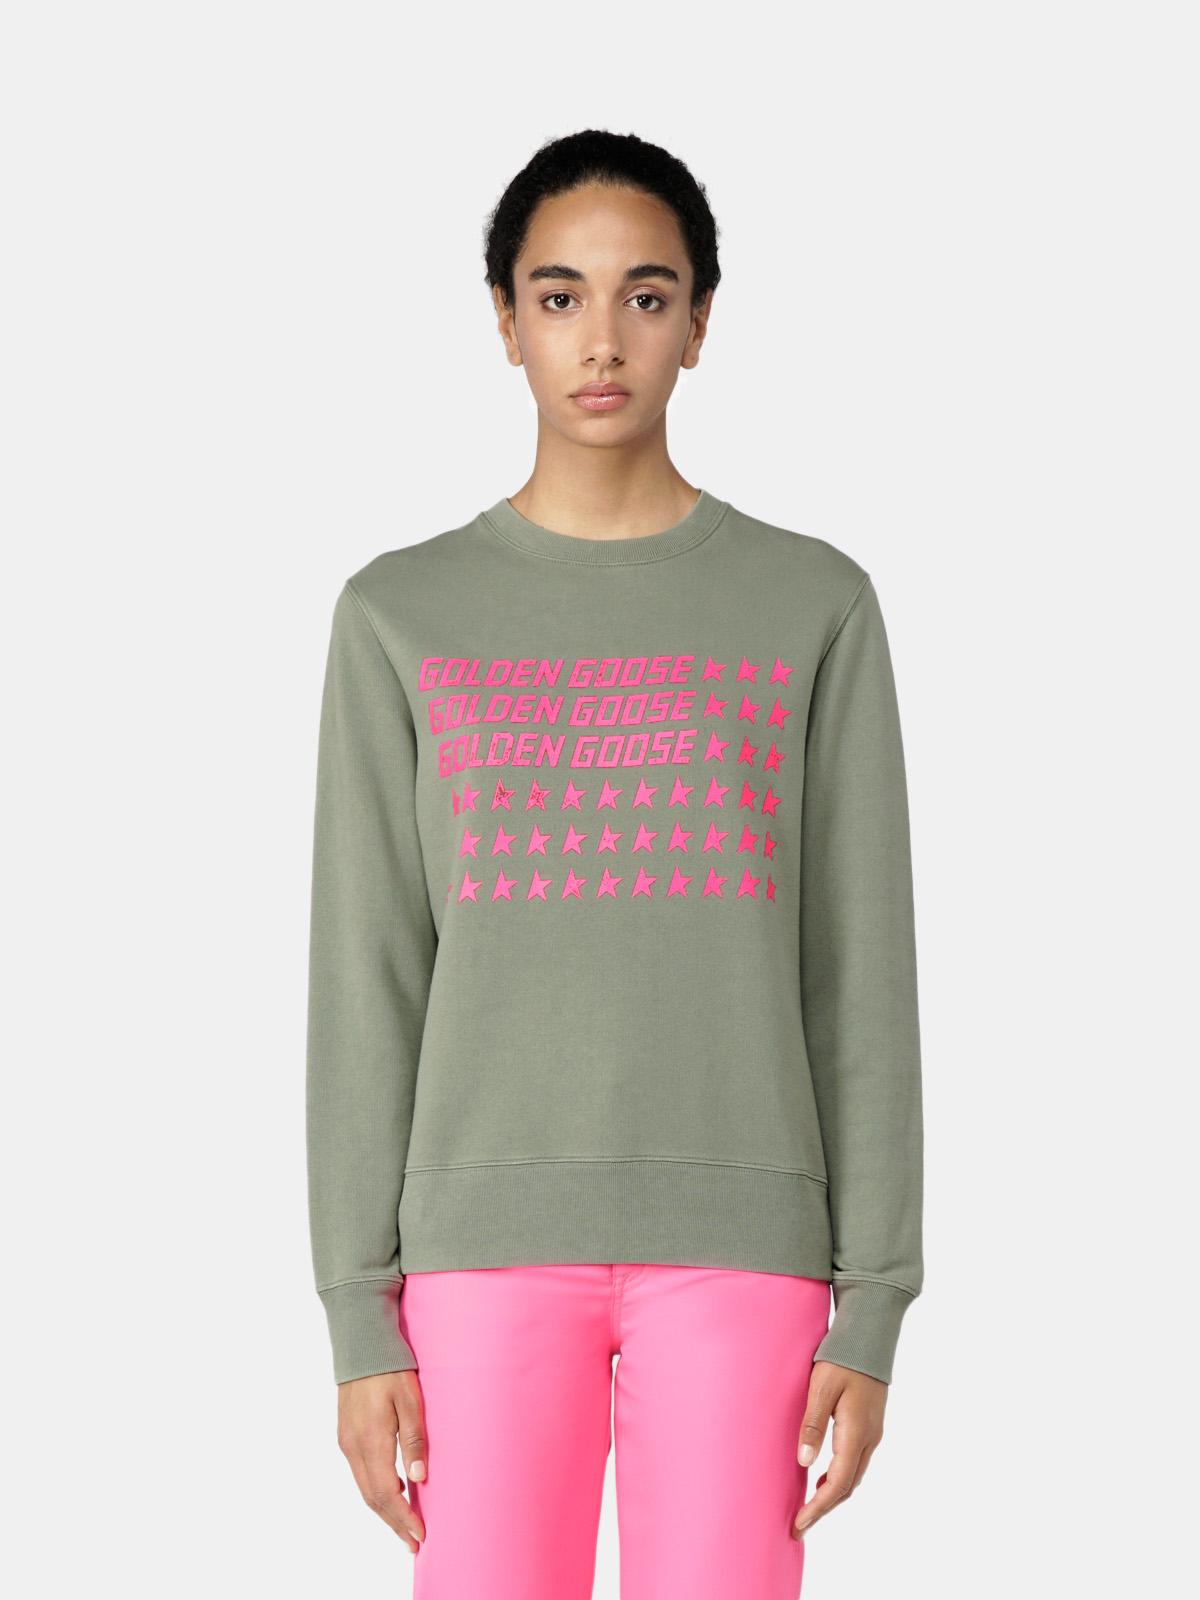 Golden Goose - Athena round-neck sweatshirt with pink flag print in